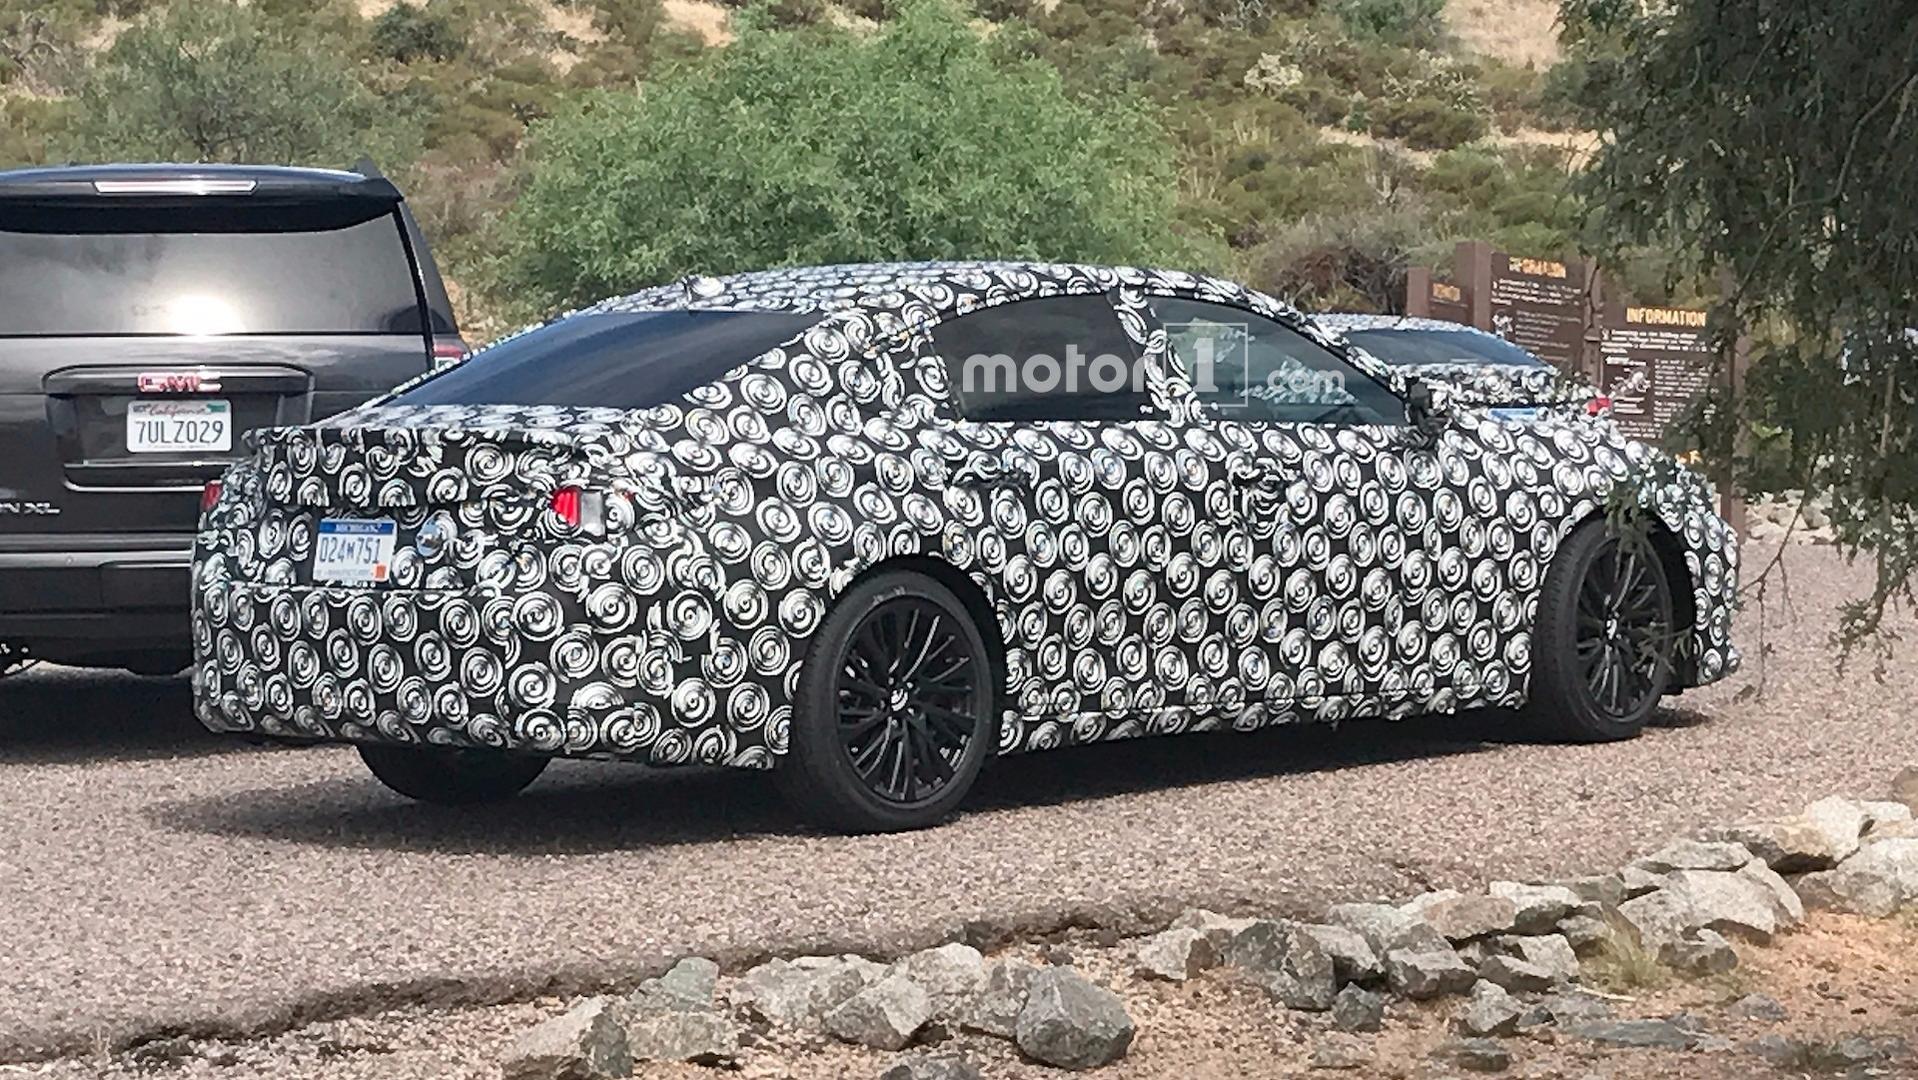 5acc570a06842 2019 lexus es spy photos لکسوس ES مدل ۲۰۱۹ خود را با تعییرات زیبا نمایش می دهد   اجاره ماشین